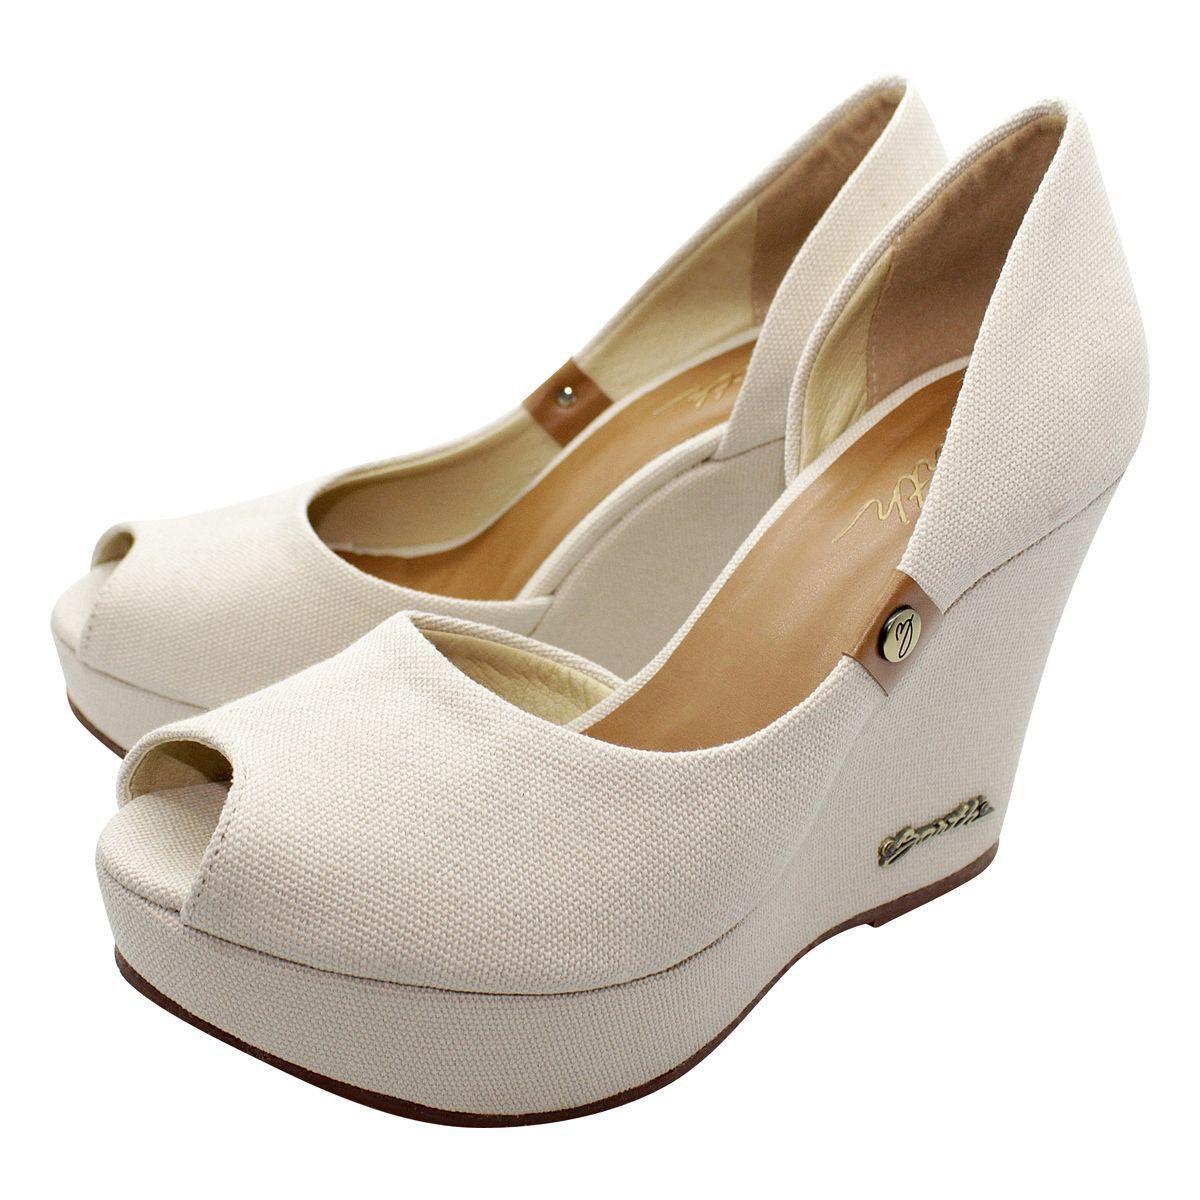 Sapato Barth Noite Sapato Barth Areia Shoes 6vwg6xqd